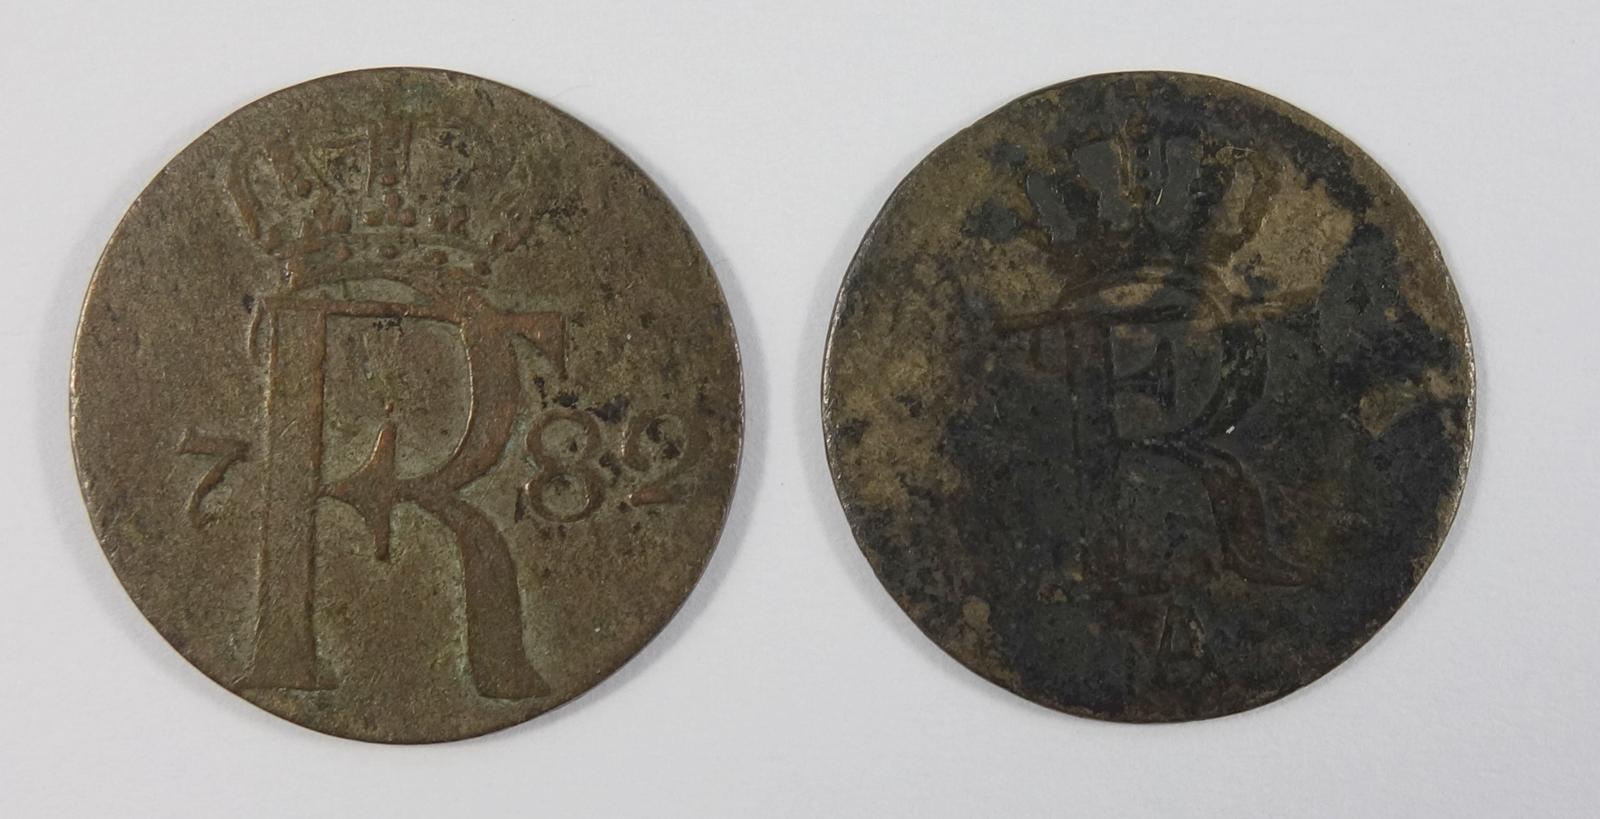 1/24 Taler 1782 A und 1/48 Taler 1773, Brandenburg-Preußen, Friedrich II., s-ss1/24 Thaler 1782 A